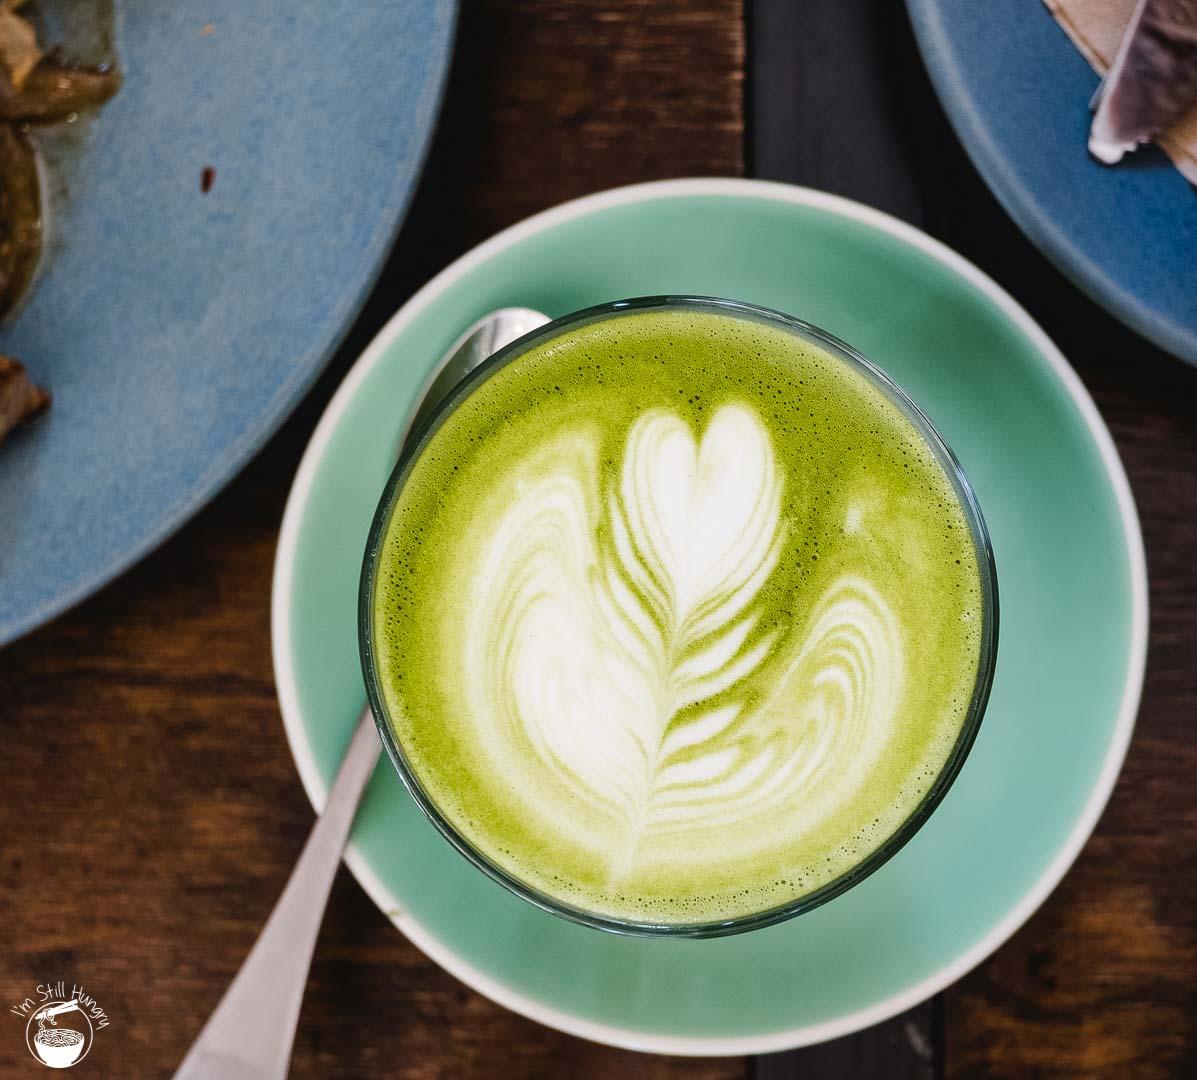 Cafe Kentaro Matcha Latte